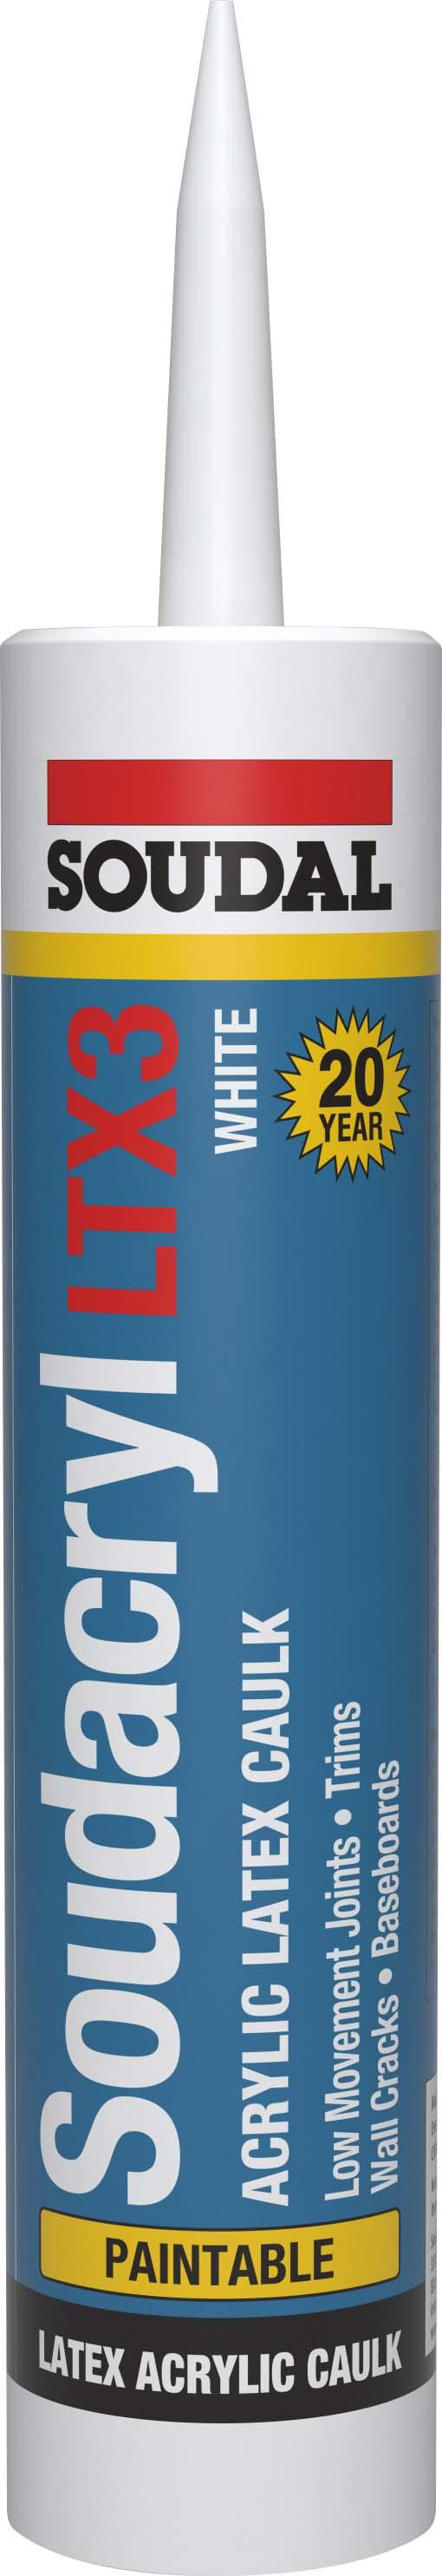 Latex Acrylics